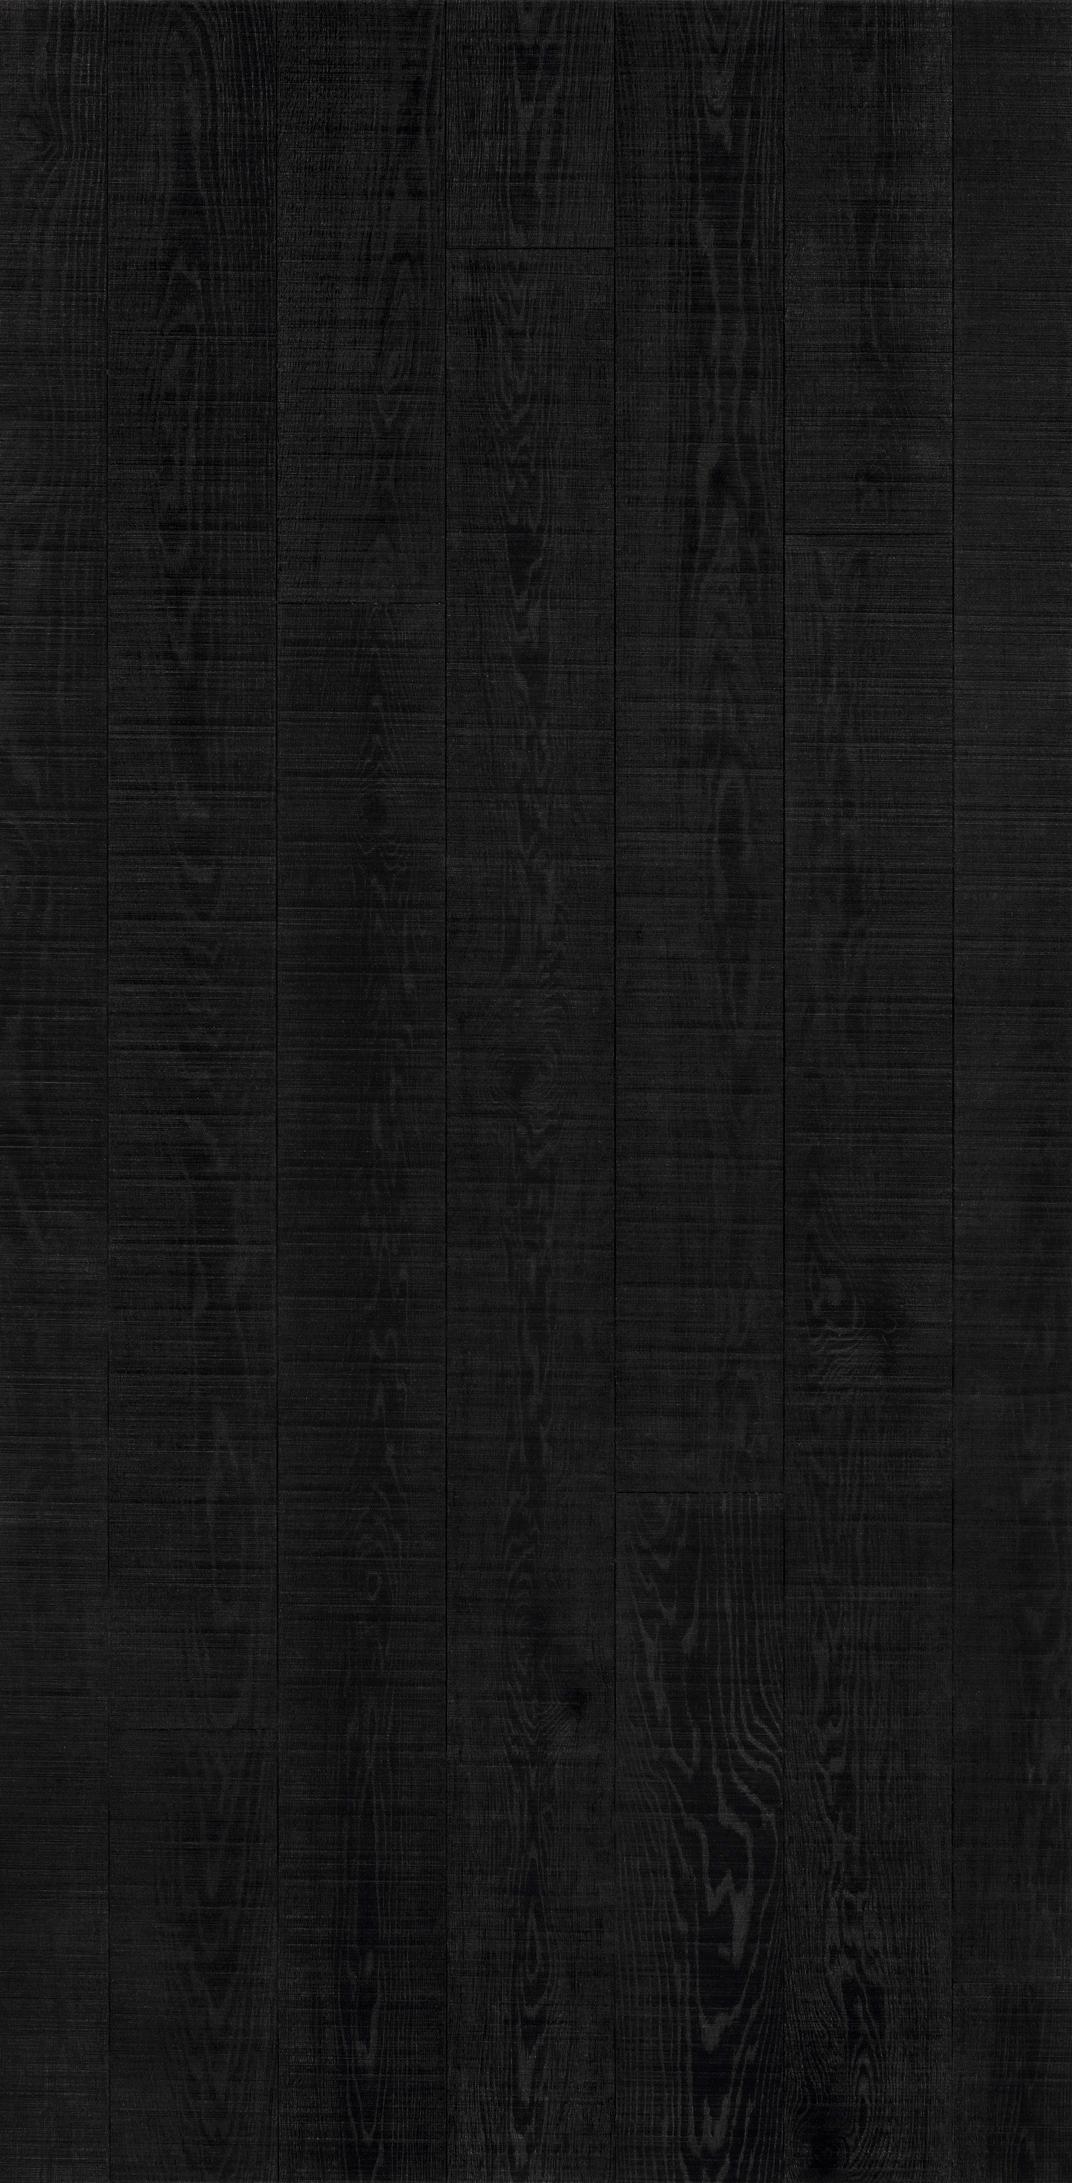 PARADOR Parkett »Trendtime 6 Living - Eiche noir Sägestruktur«, 2200 x 185 mm, Stärke: 13 mm, 3,66 m² | Baumarkt > Bodenbeläge > Parkett | PARADOR